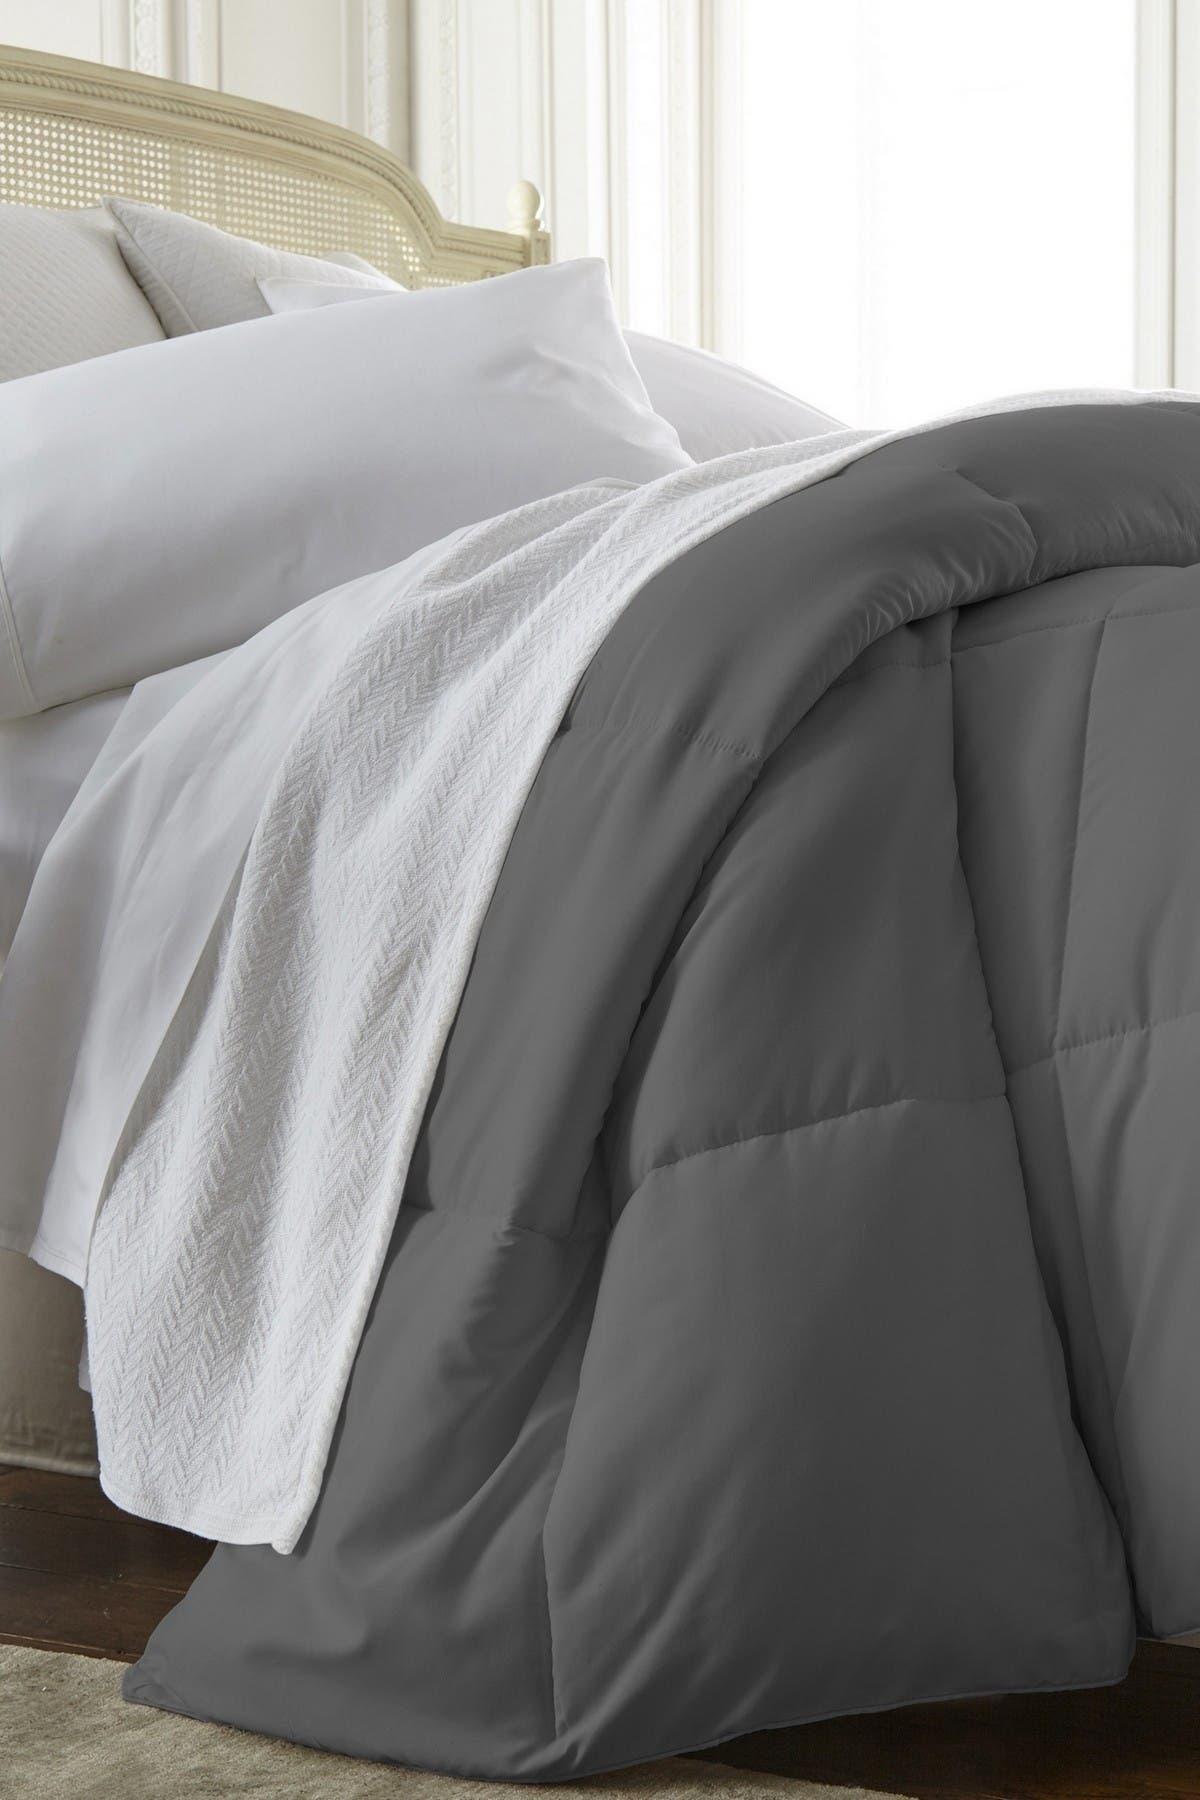 Image of IENJOY HOME Home Spun All Season Premium Down Alternative Twin Comforter - Gray